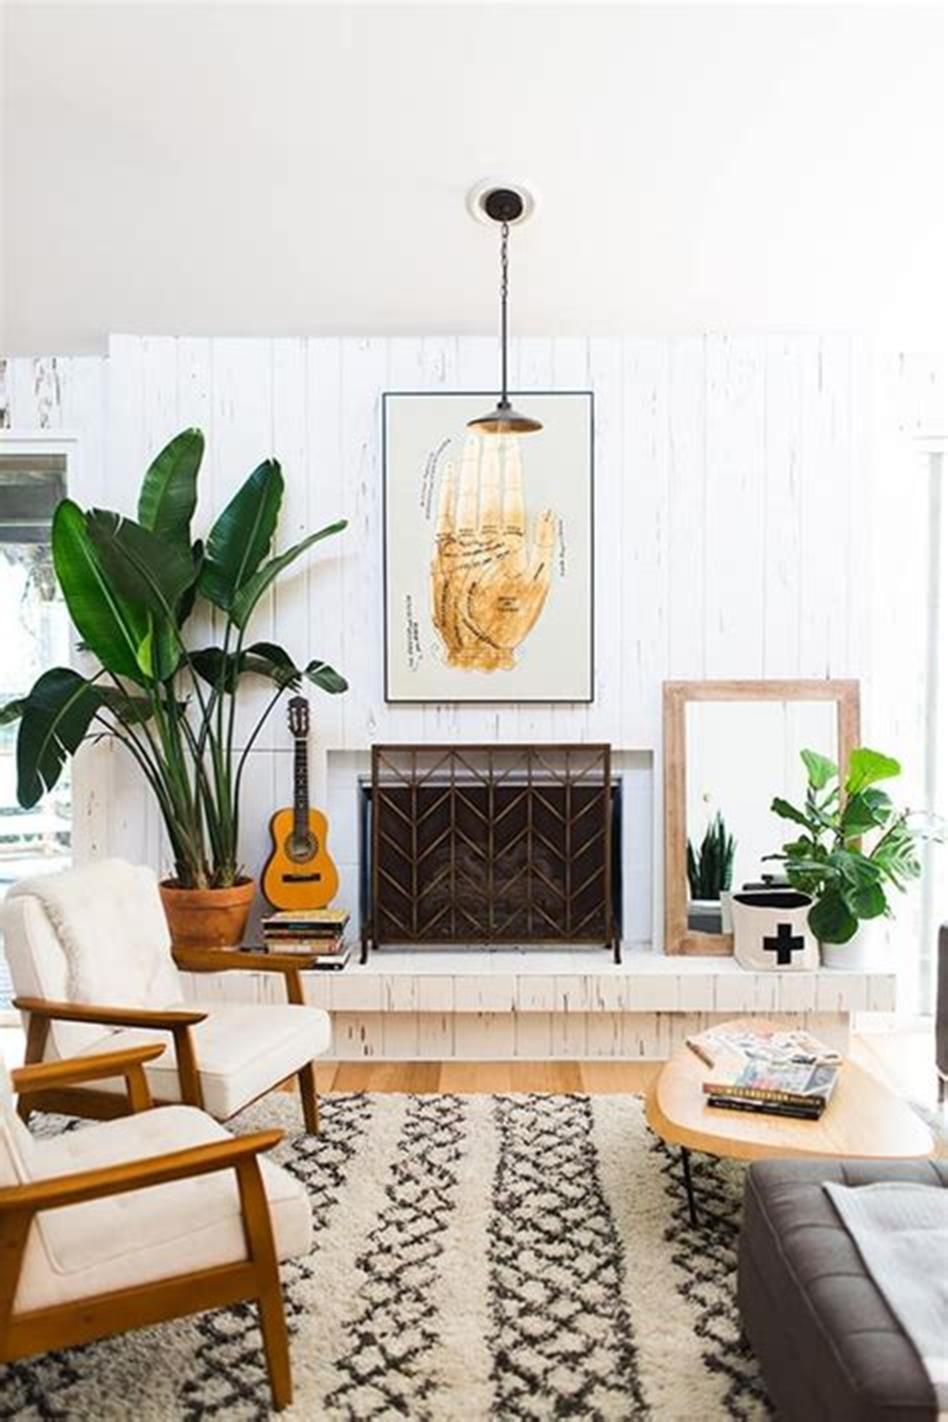 47 Great Mid Century Modern Living Room Design And Decorating Ideas Mid Century Modern Living Room Design Living Room Design Modern Modern Bohemian Living Room